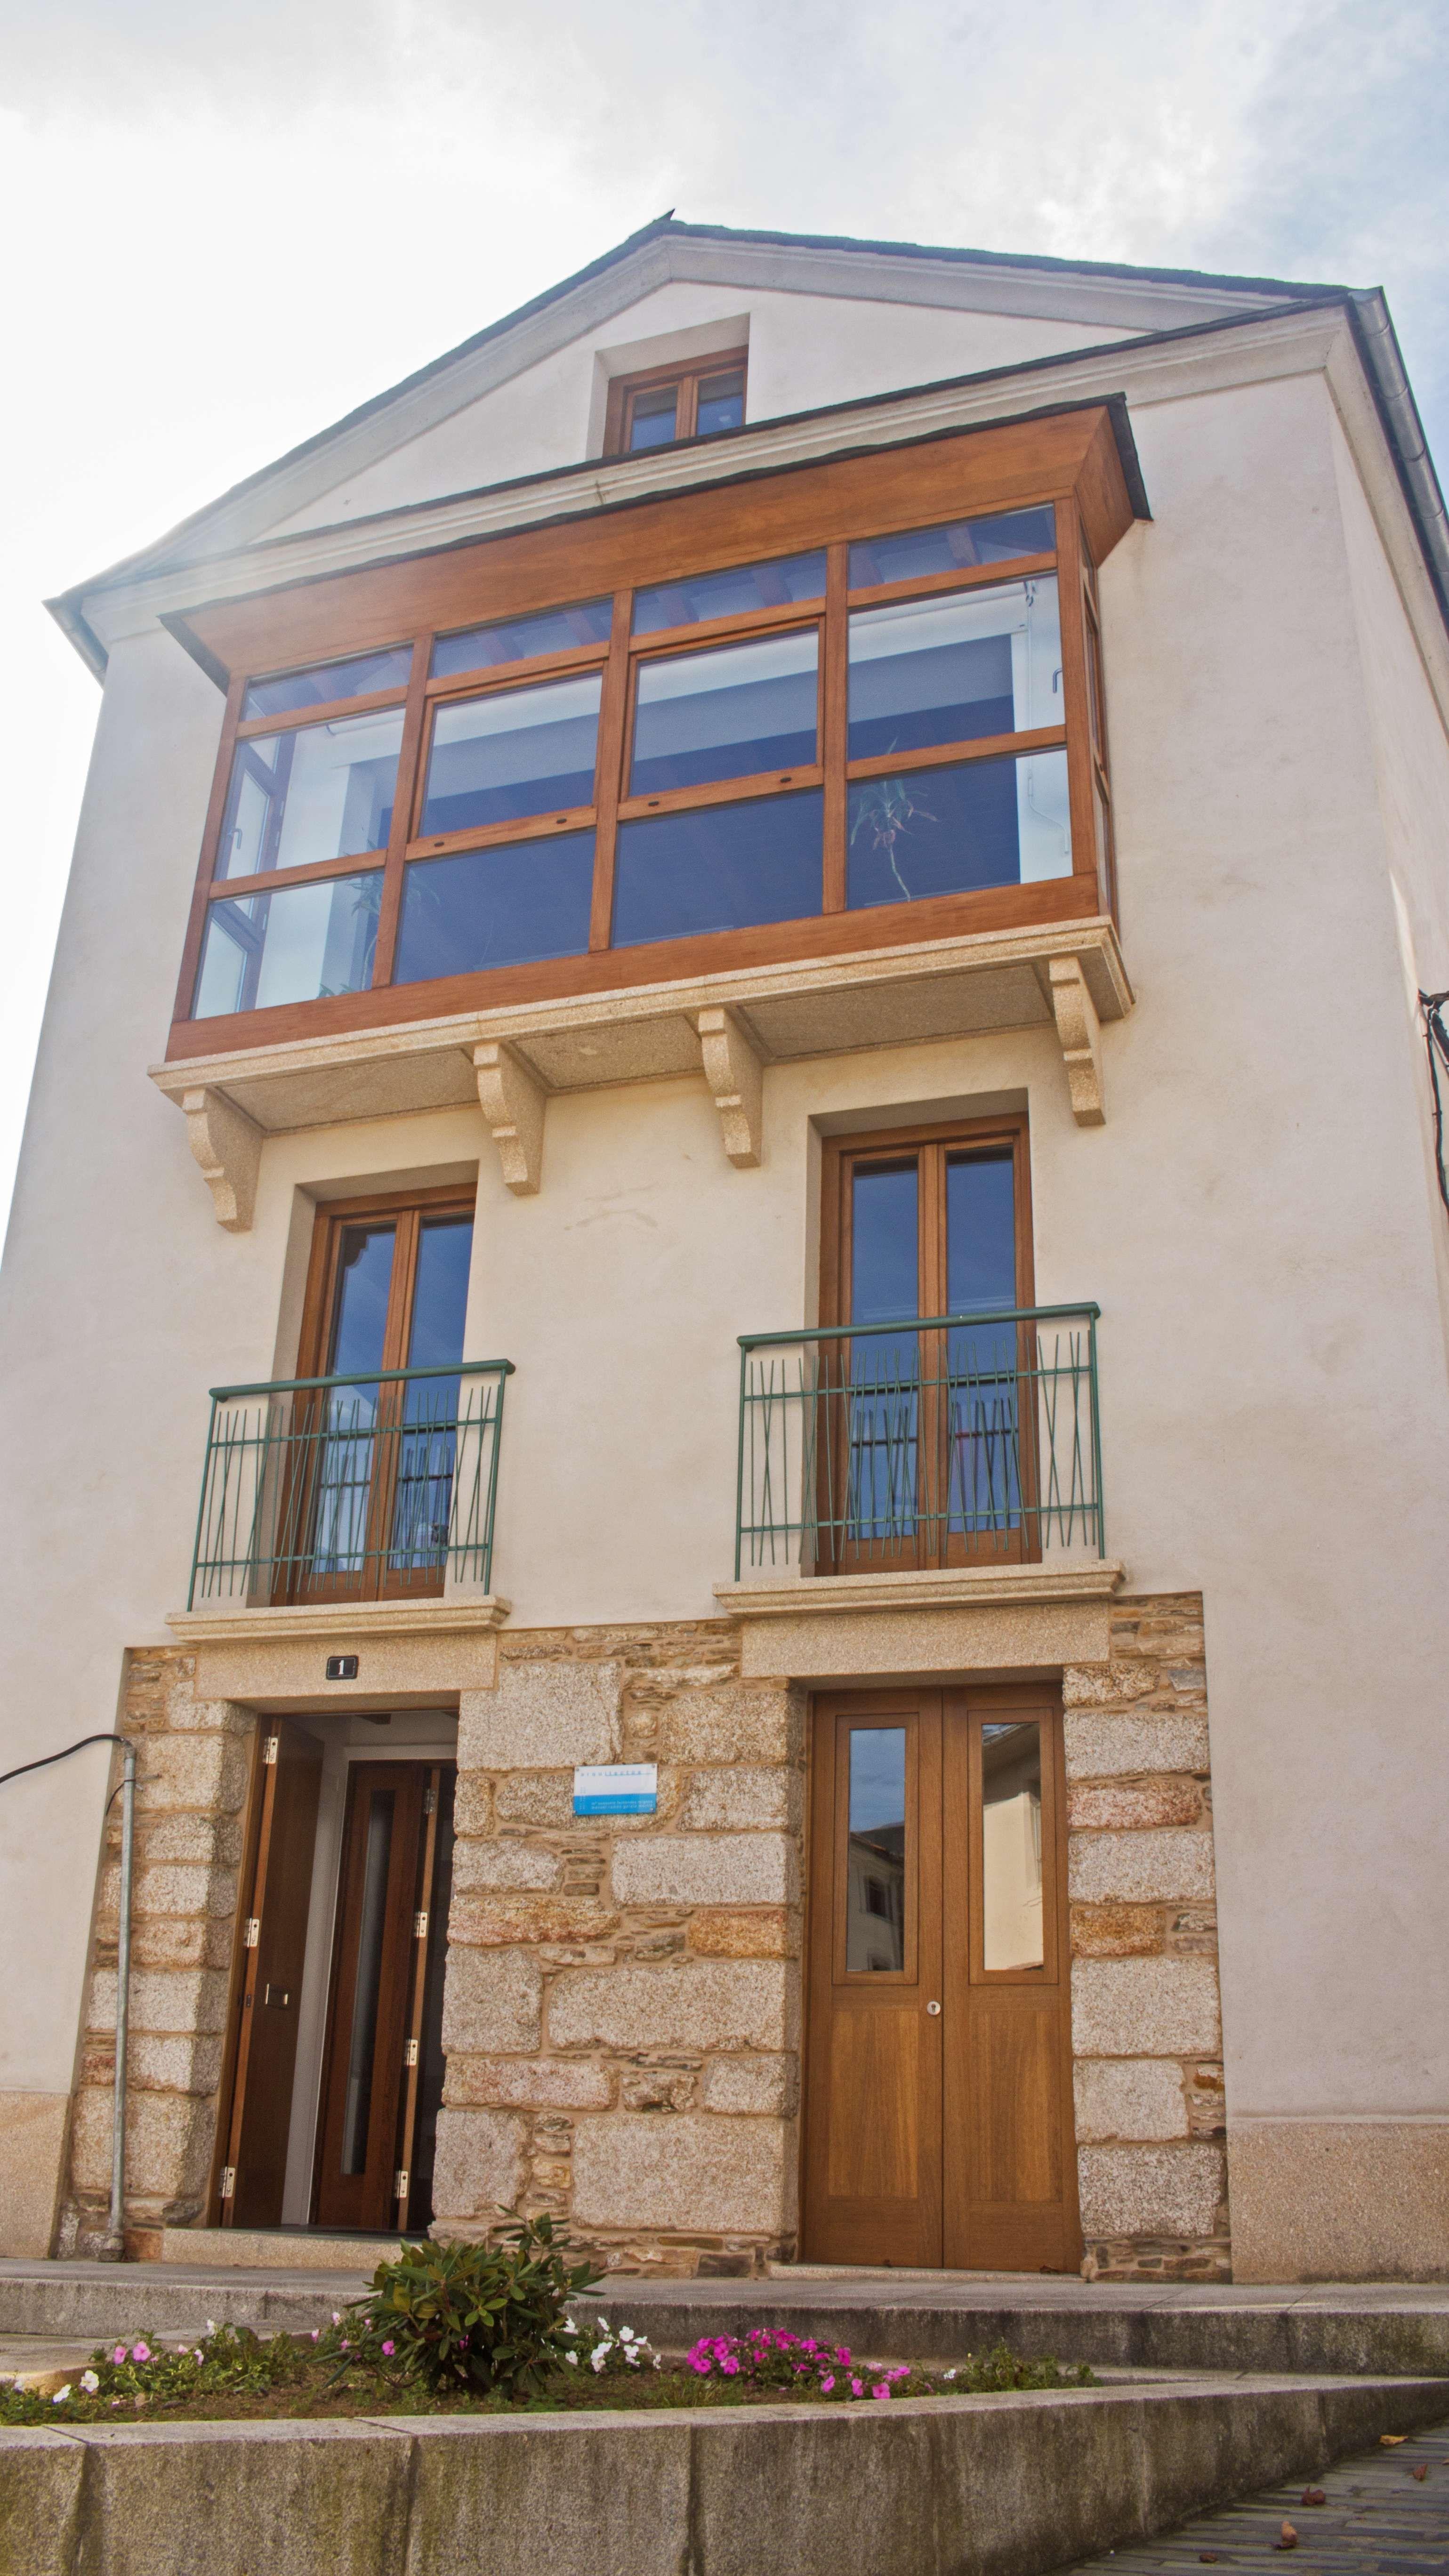 Asesoramiento arquitectónico en Mondoñedo